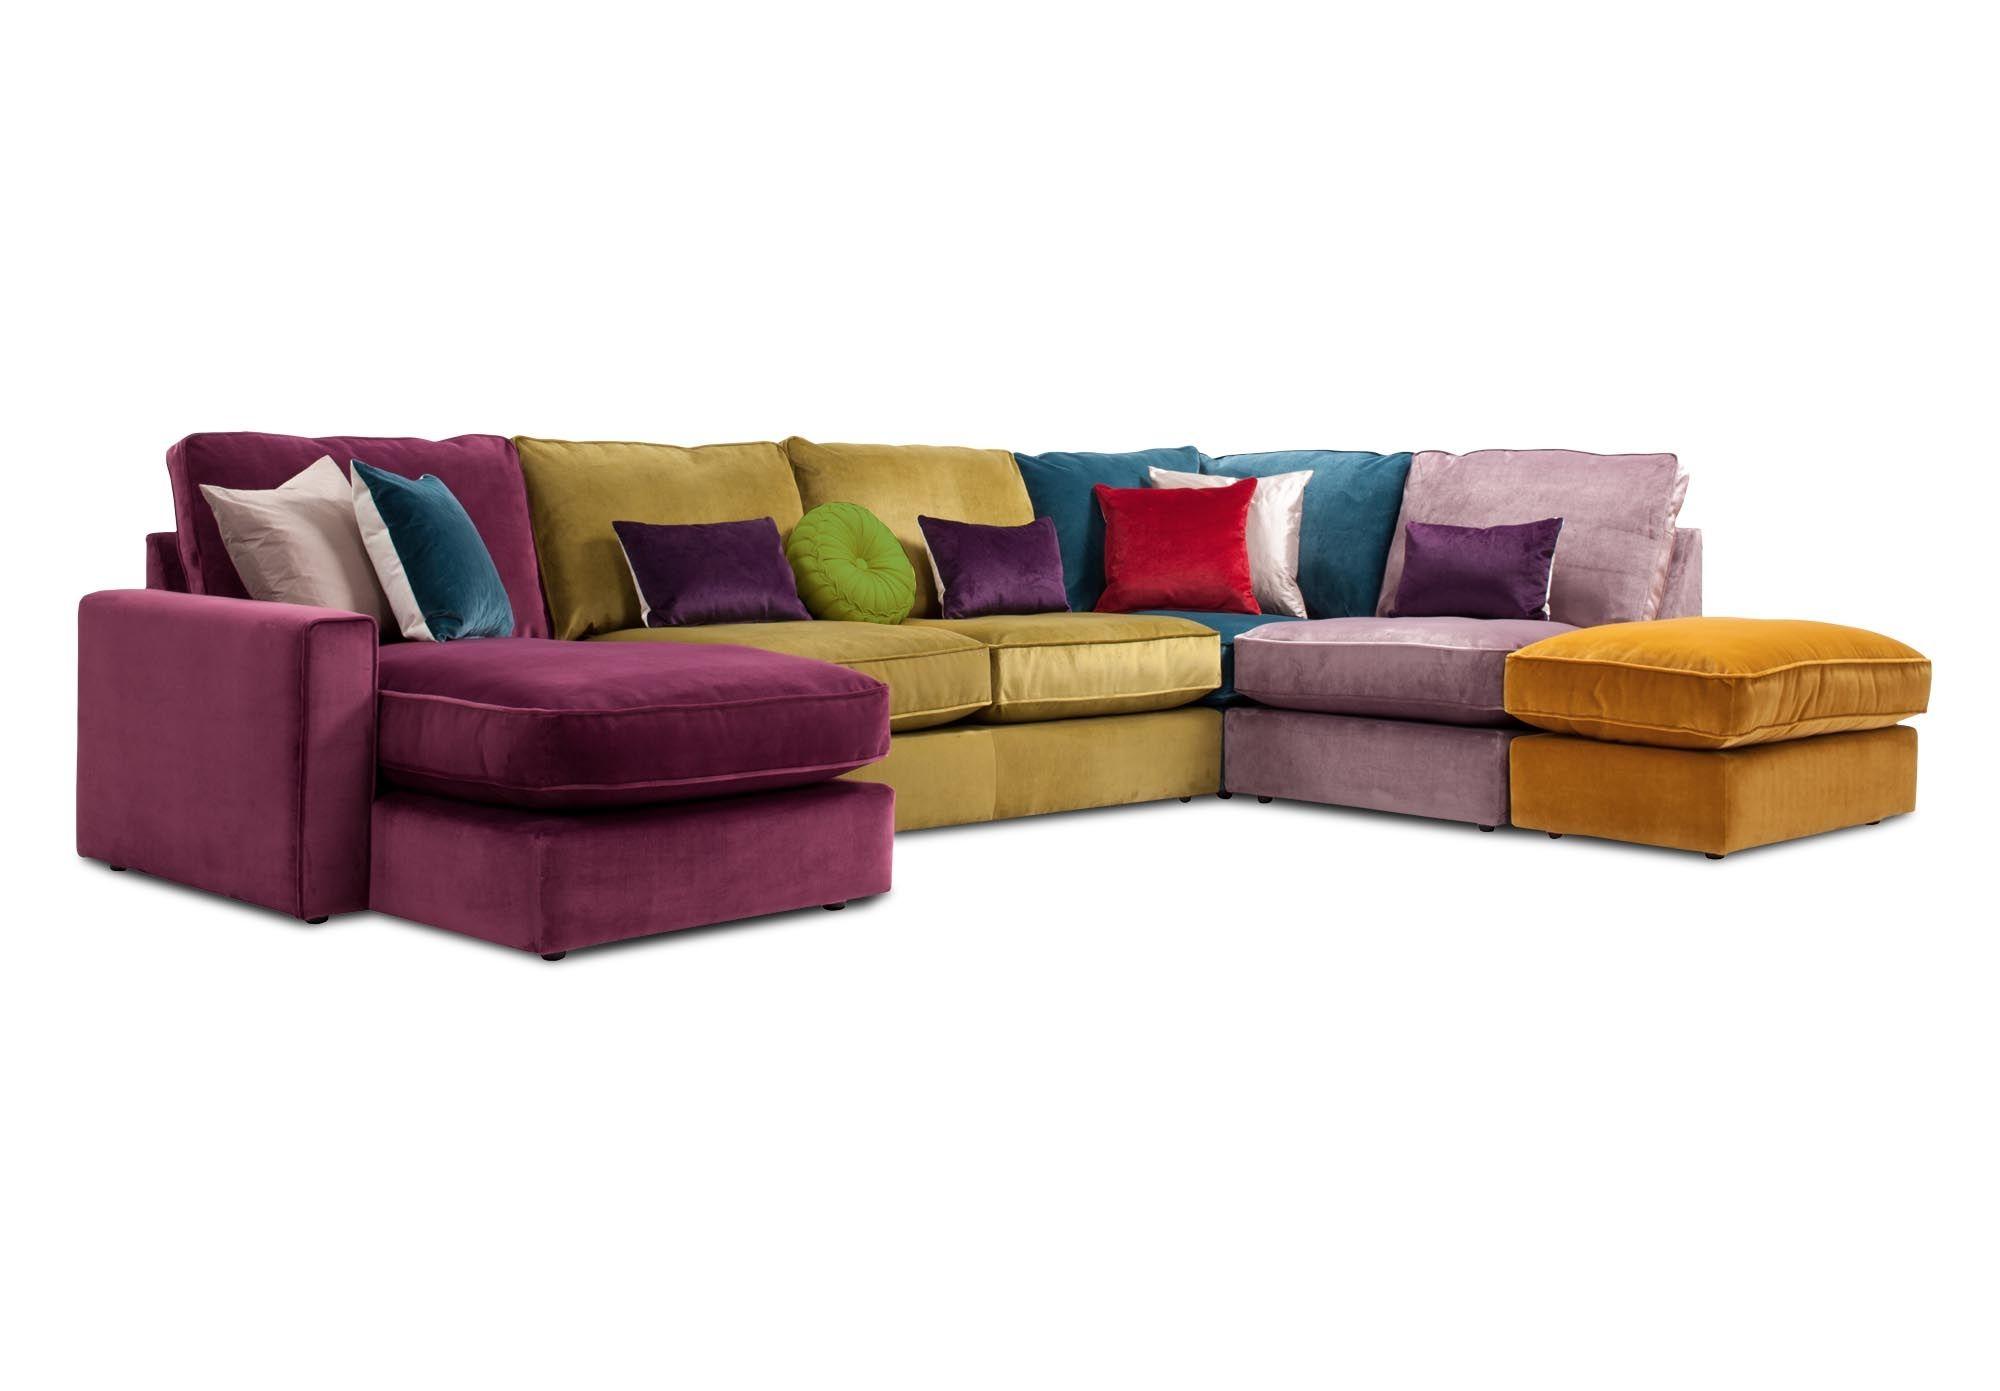 24 best corner sofa images on Pinterest